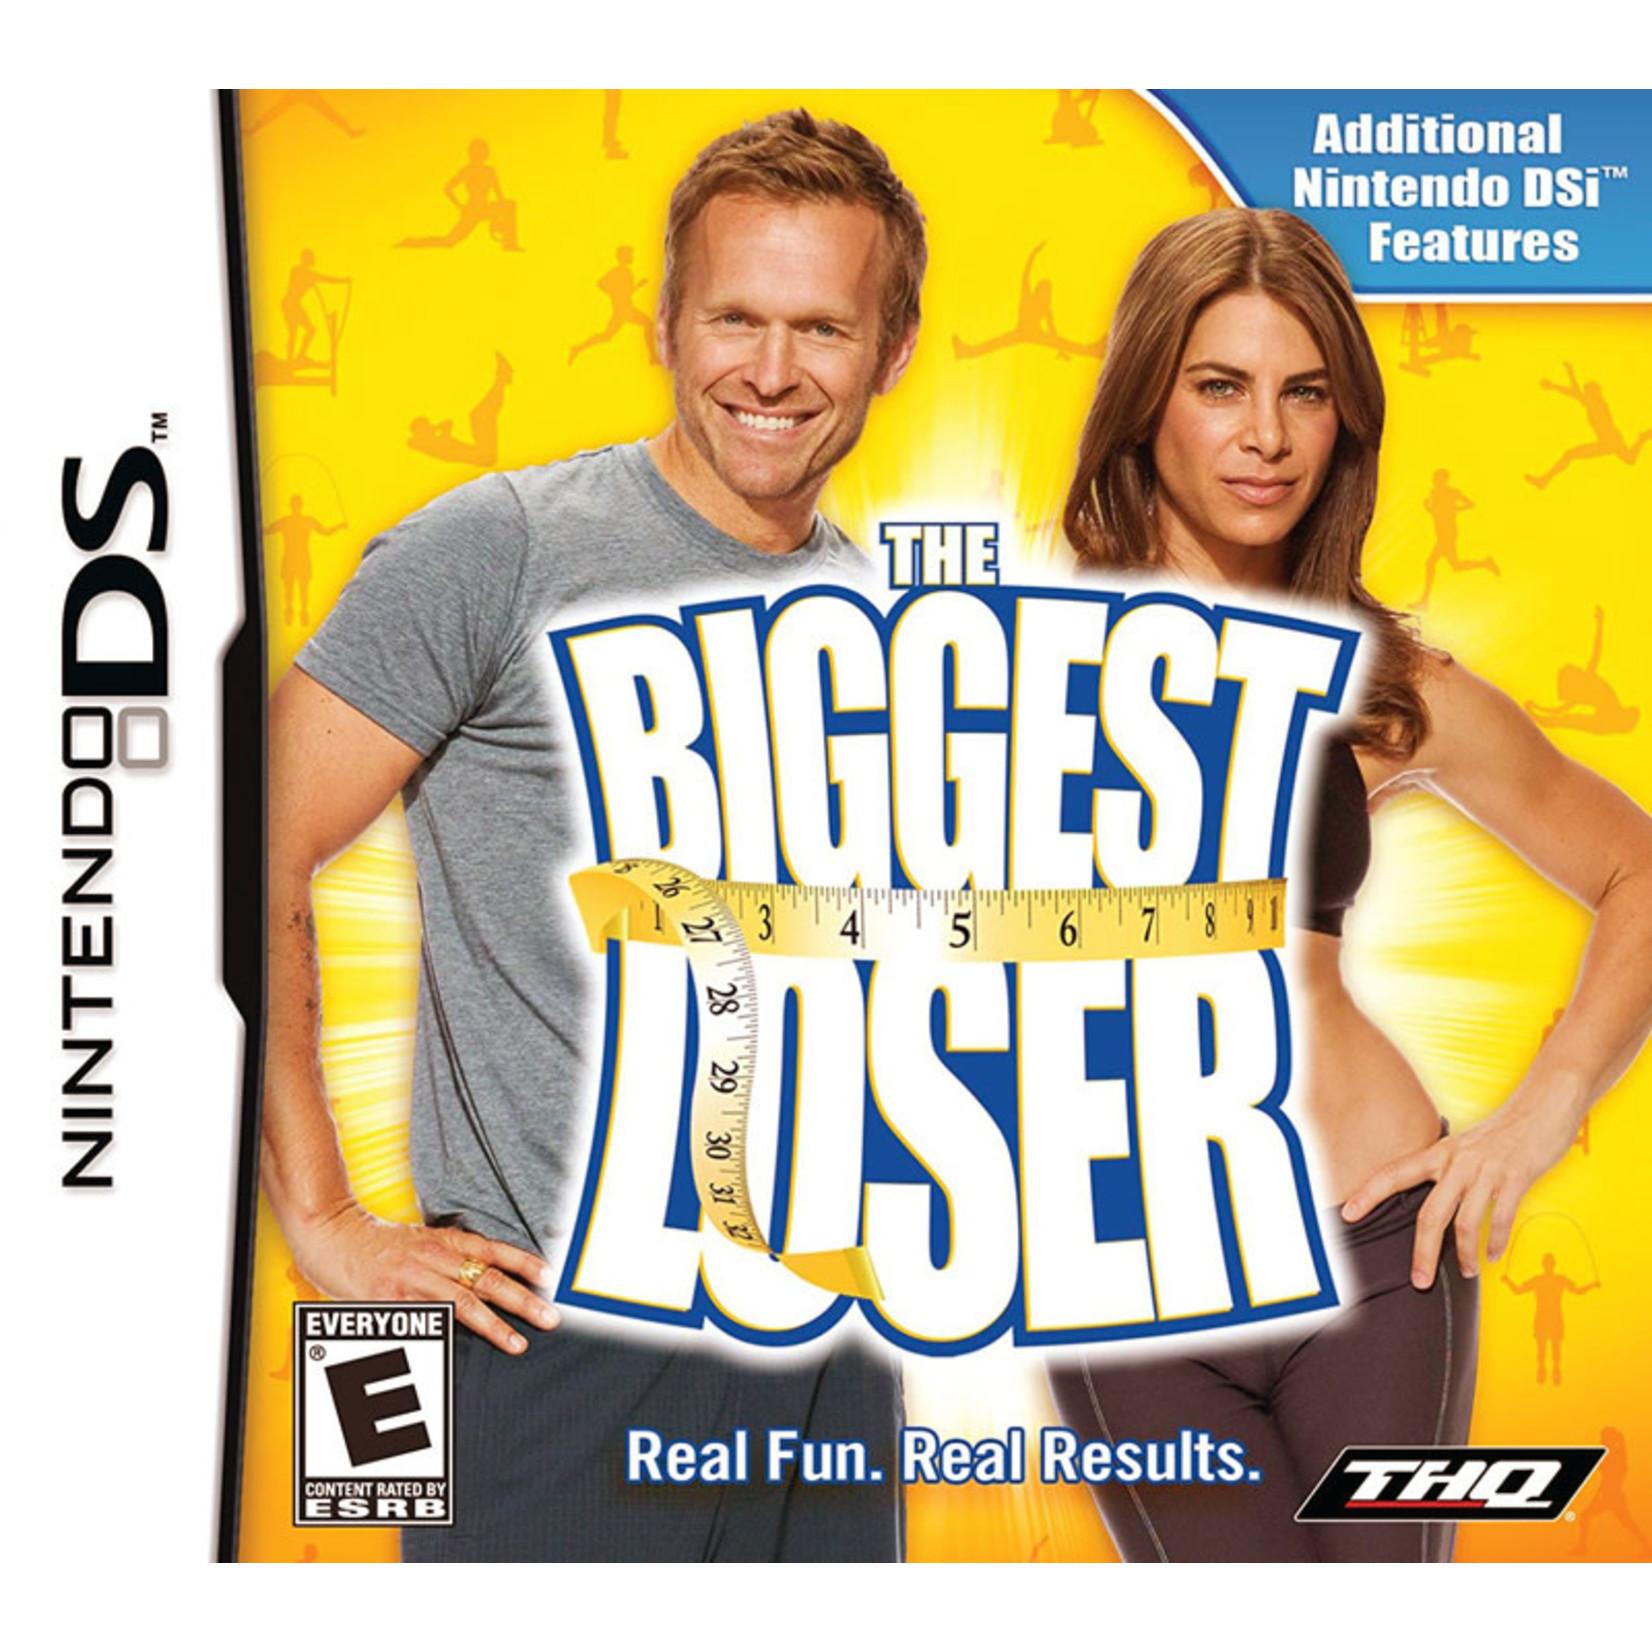 DSU-BIGGEST LOSER